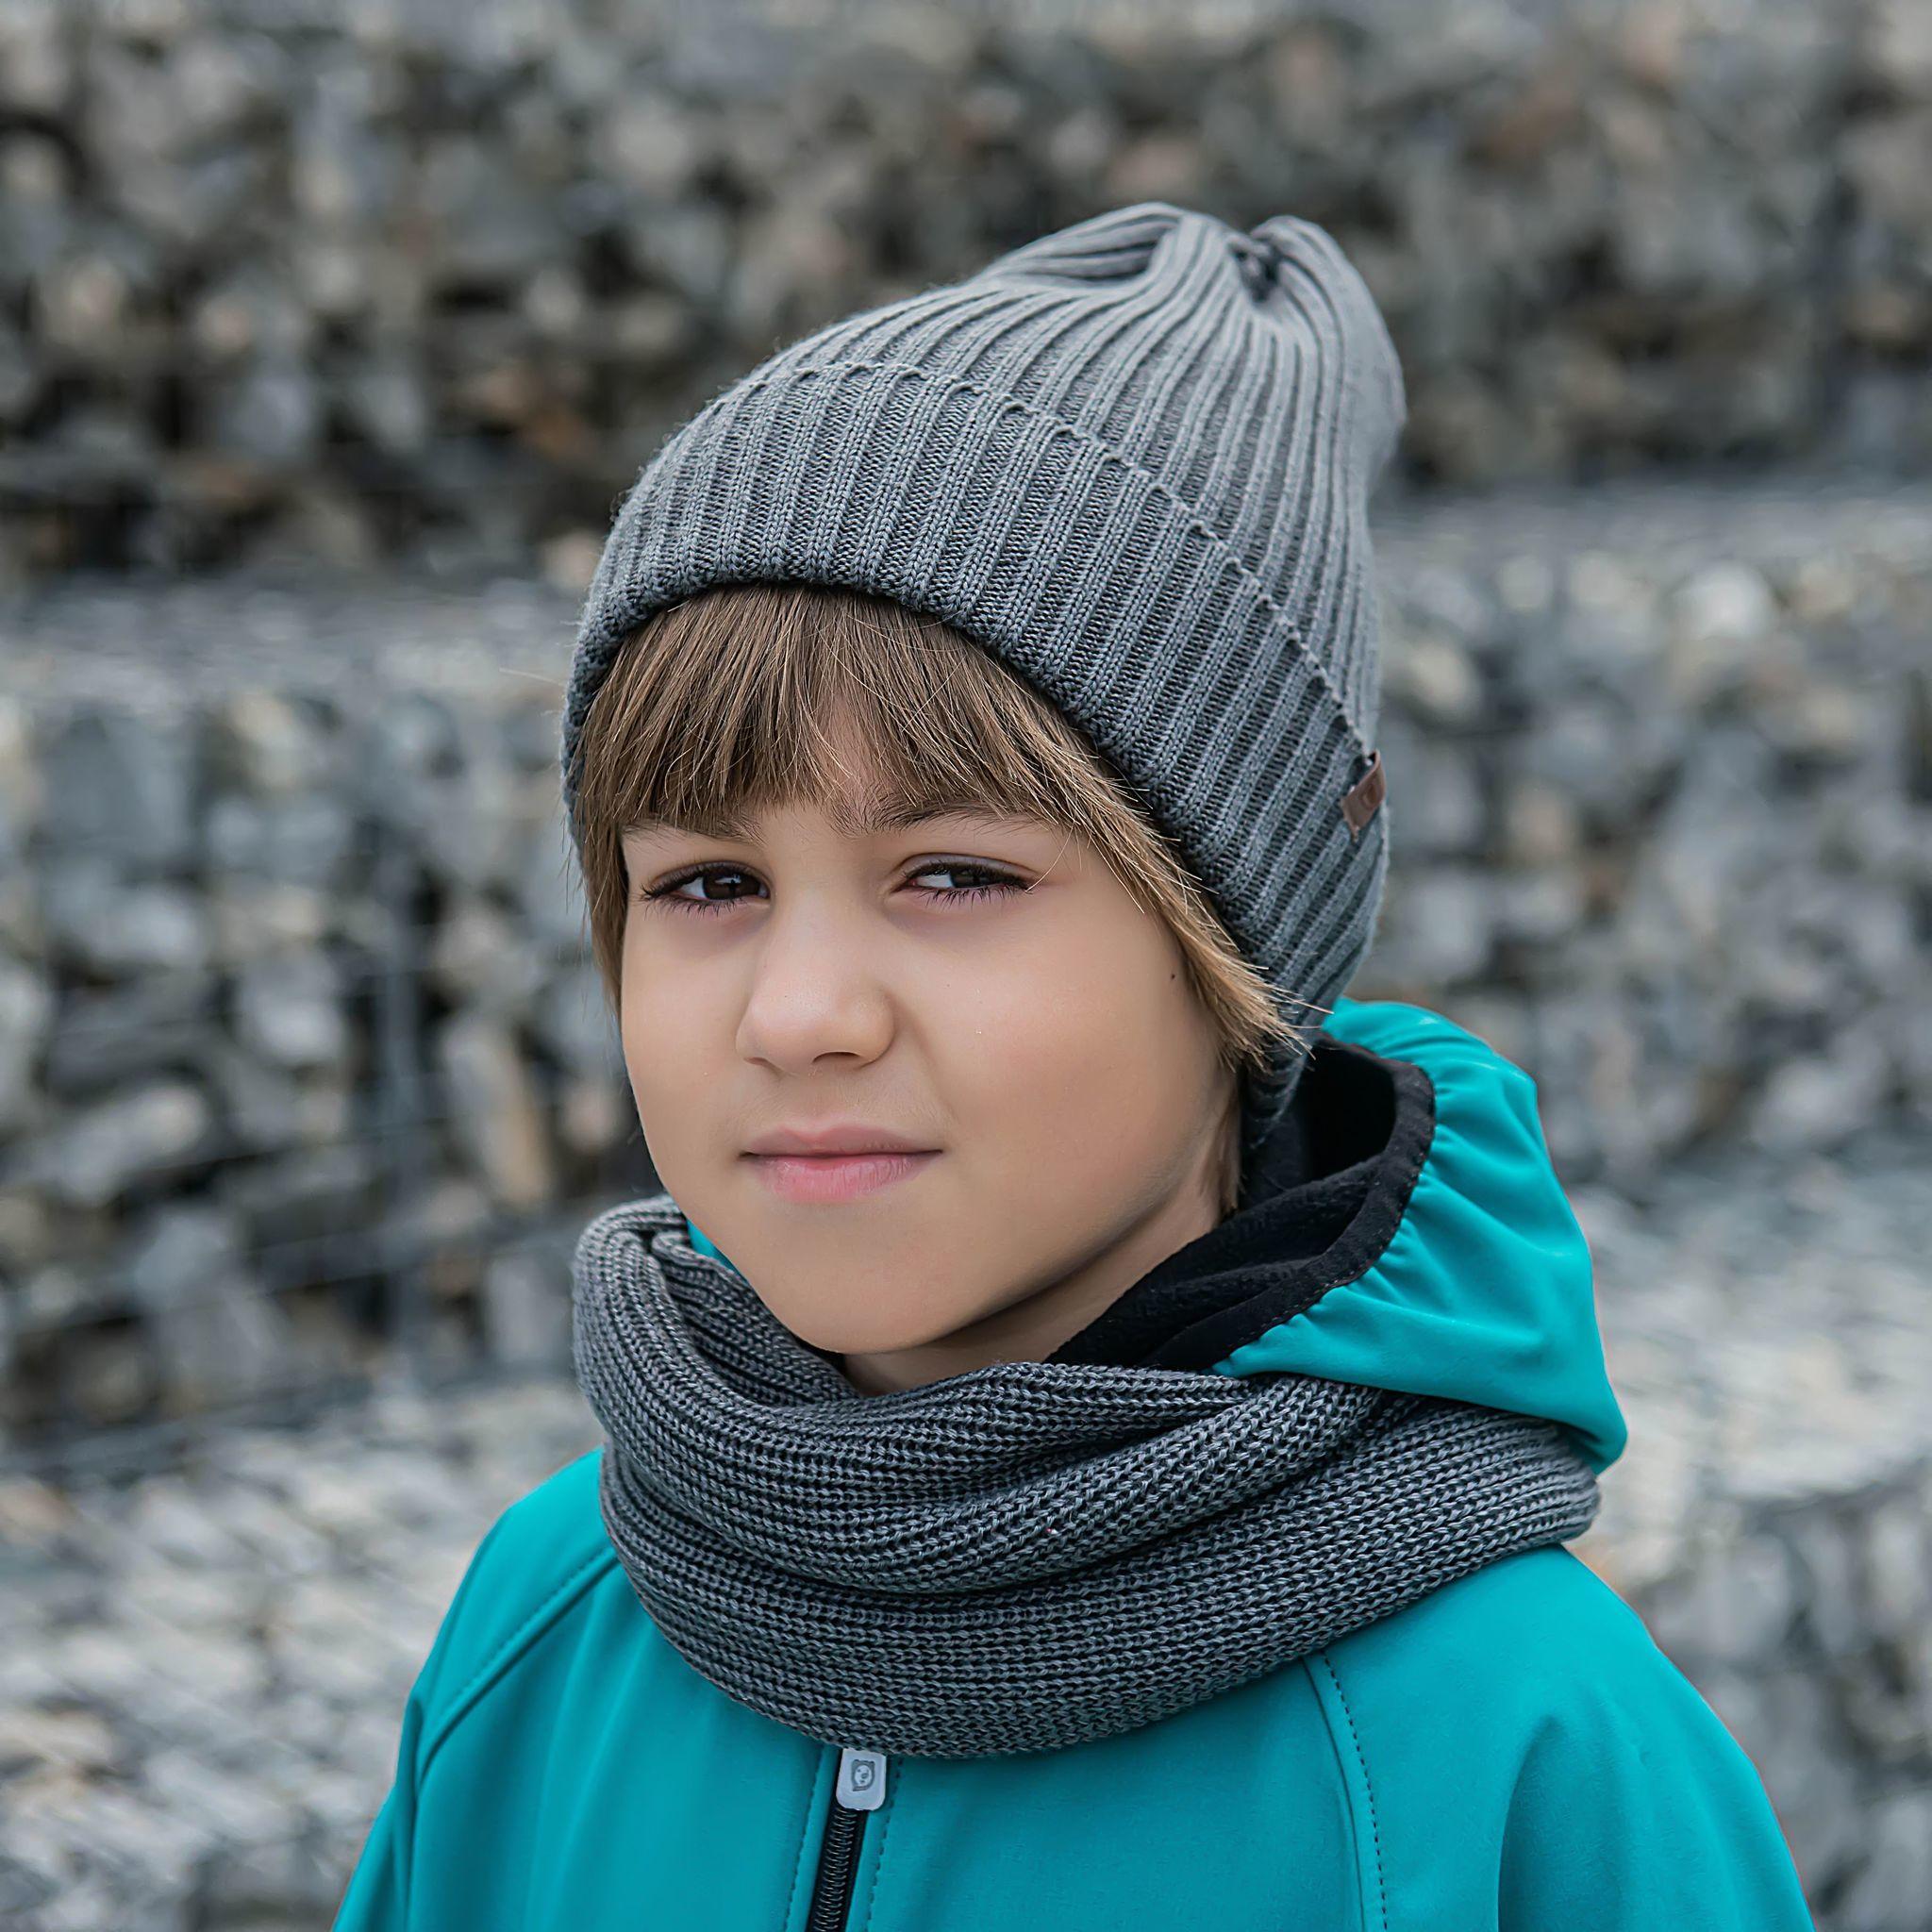 Beanie hat for teens - Graphite